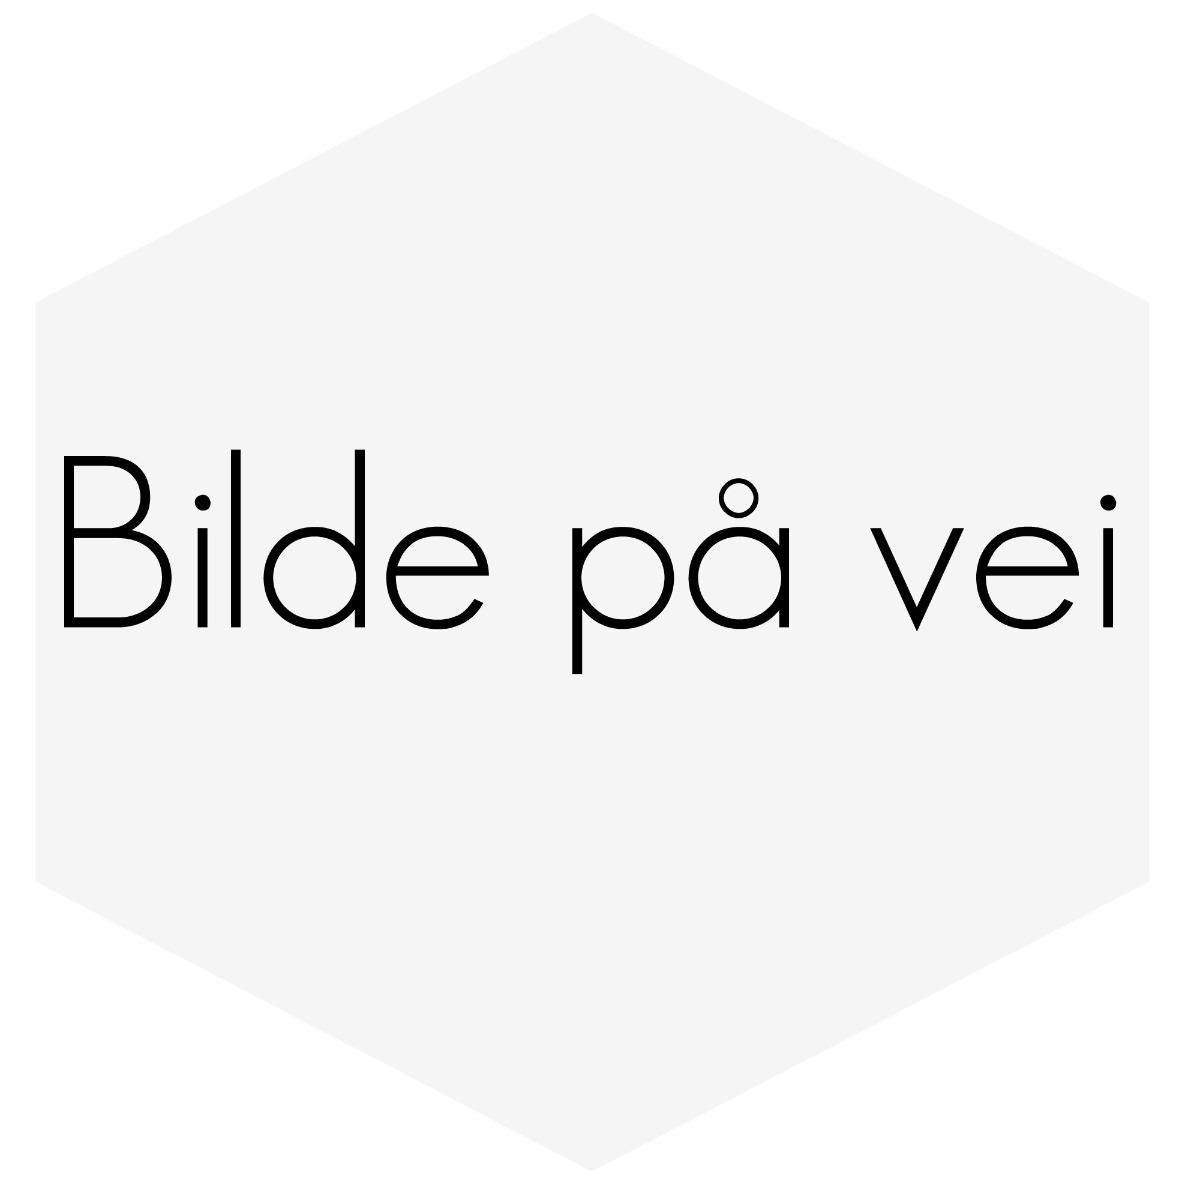 BREMSECALIPER FORAN AMAZON/P1800 62-68 1 KRETS HØYRE S.